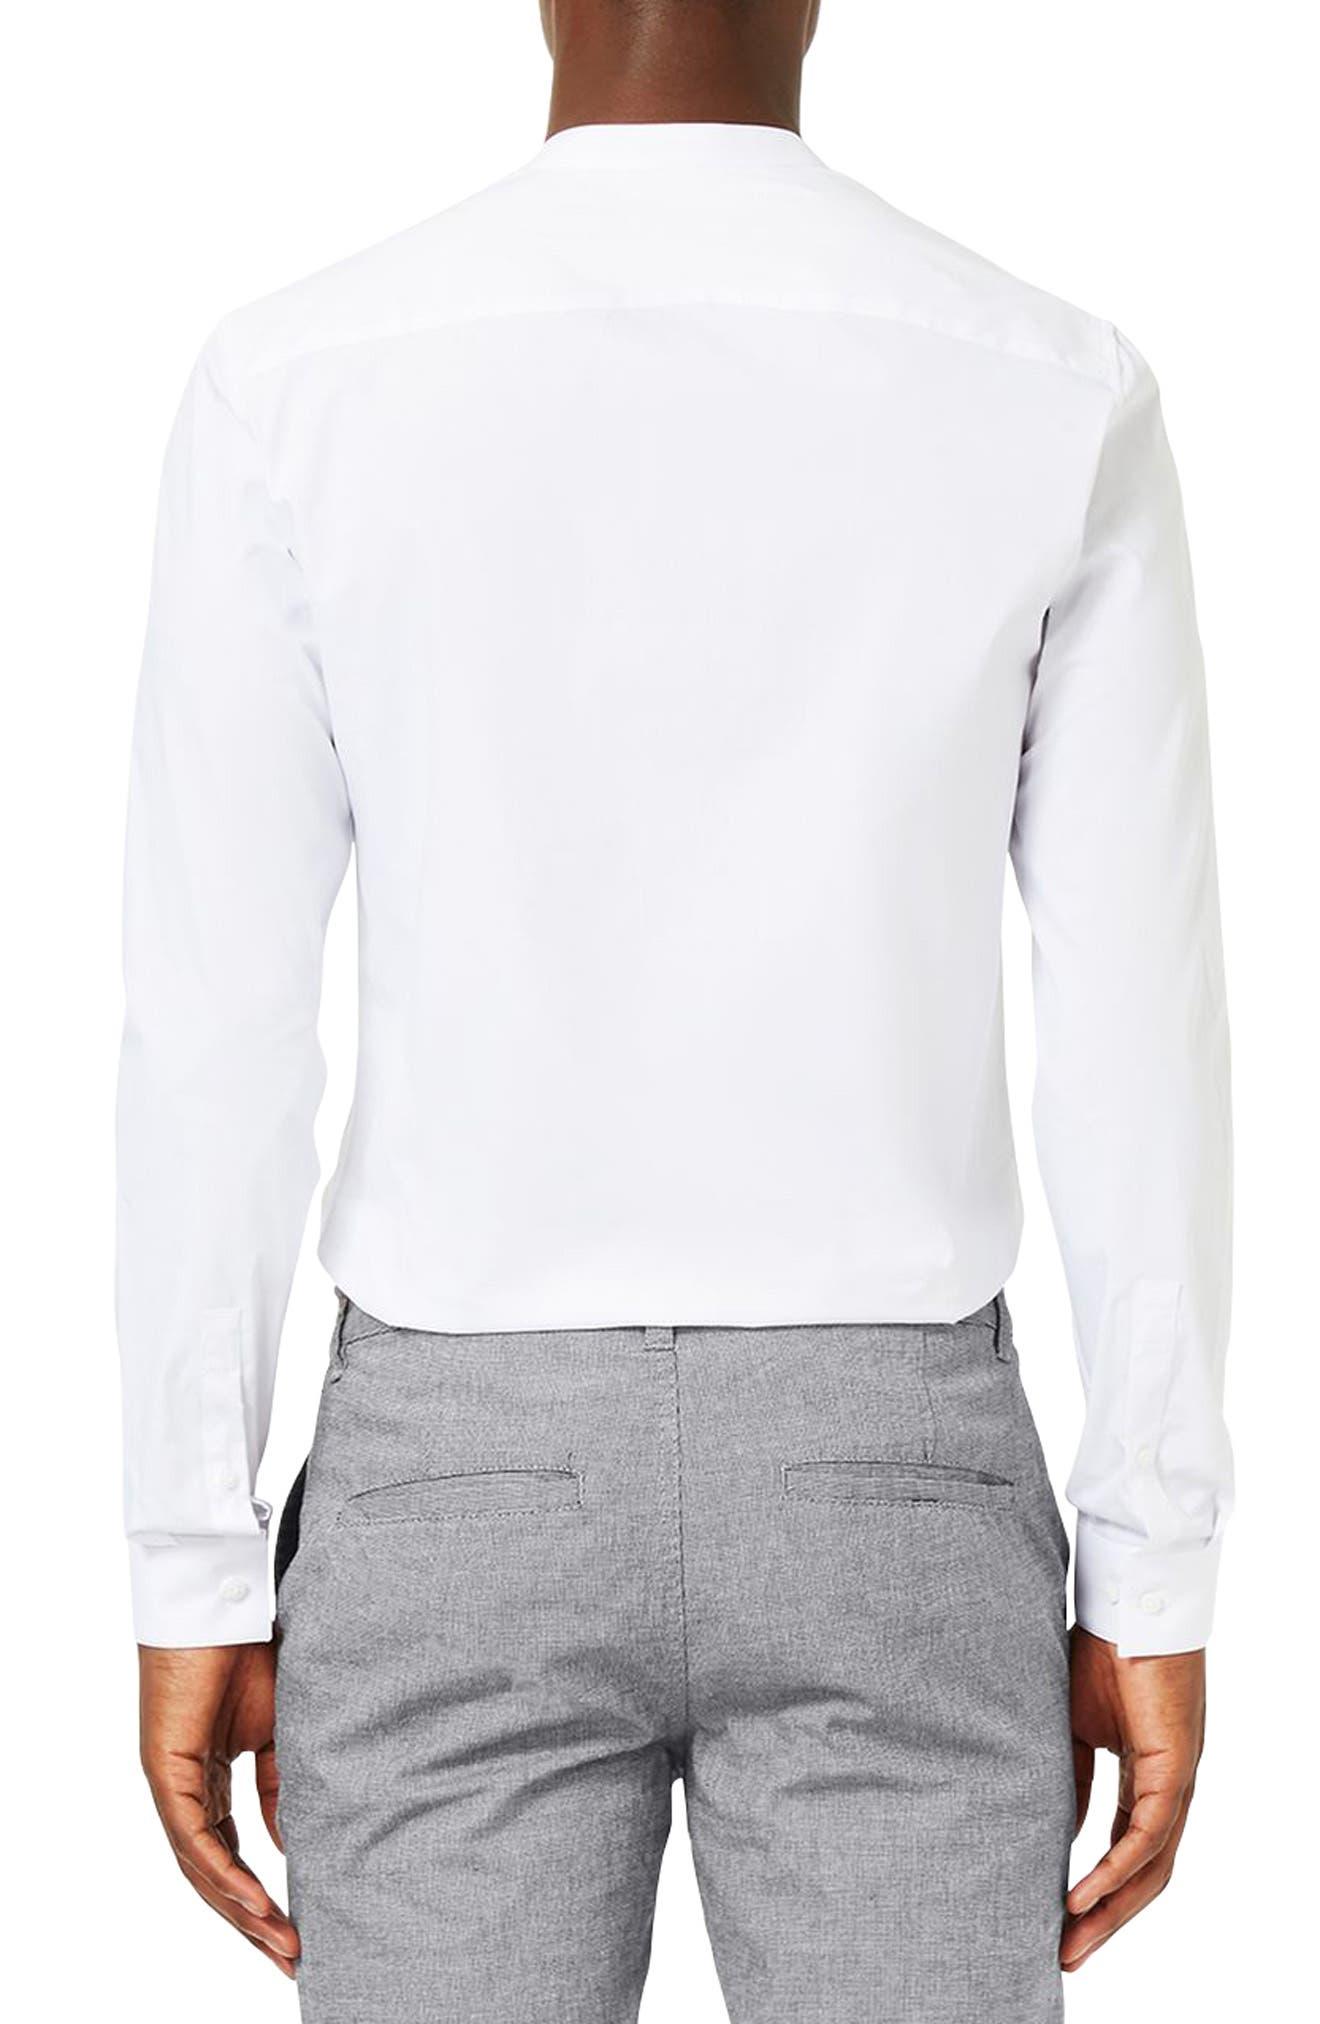 Band Collar Skinny Fit Dress Shirt,                             Alternate thumbnail 3, color,                             WHITE